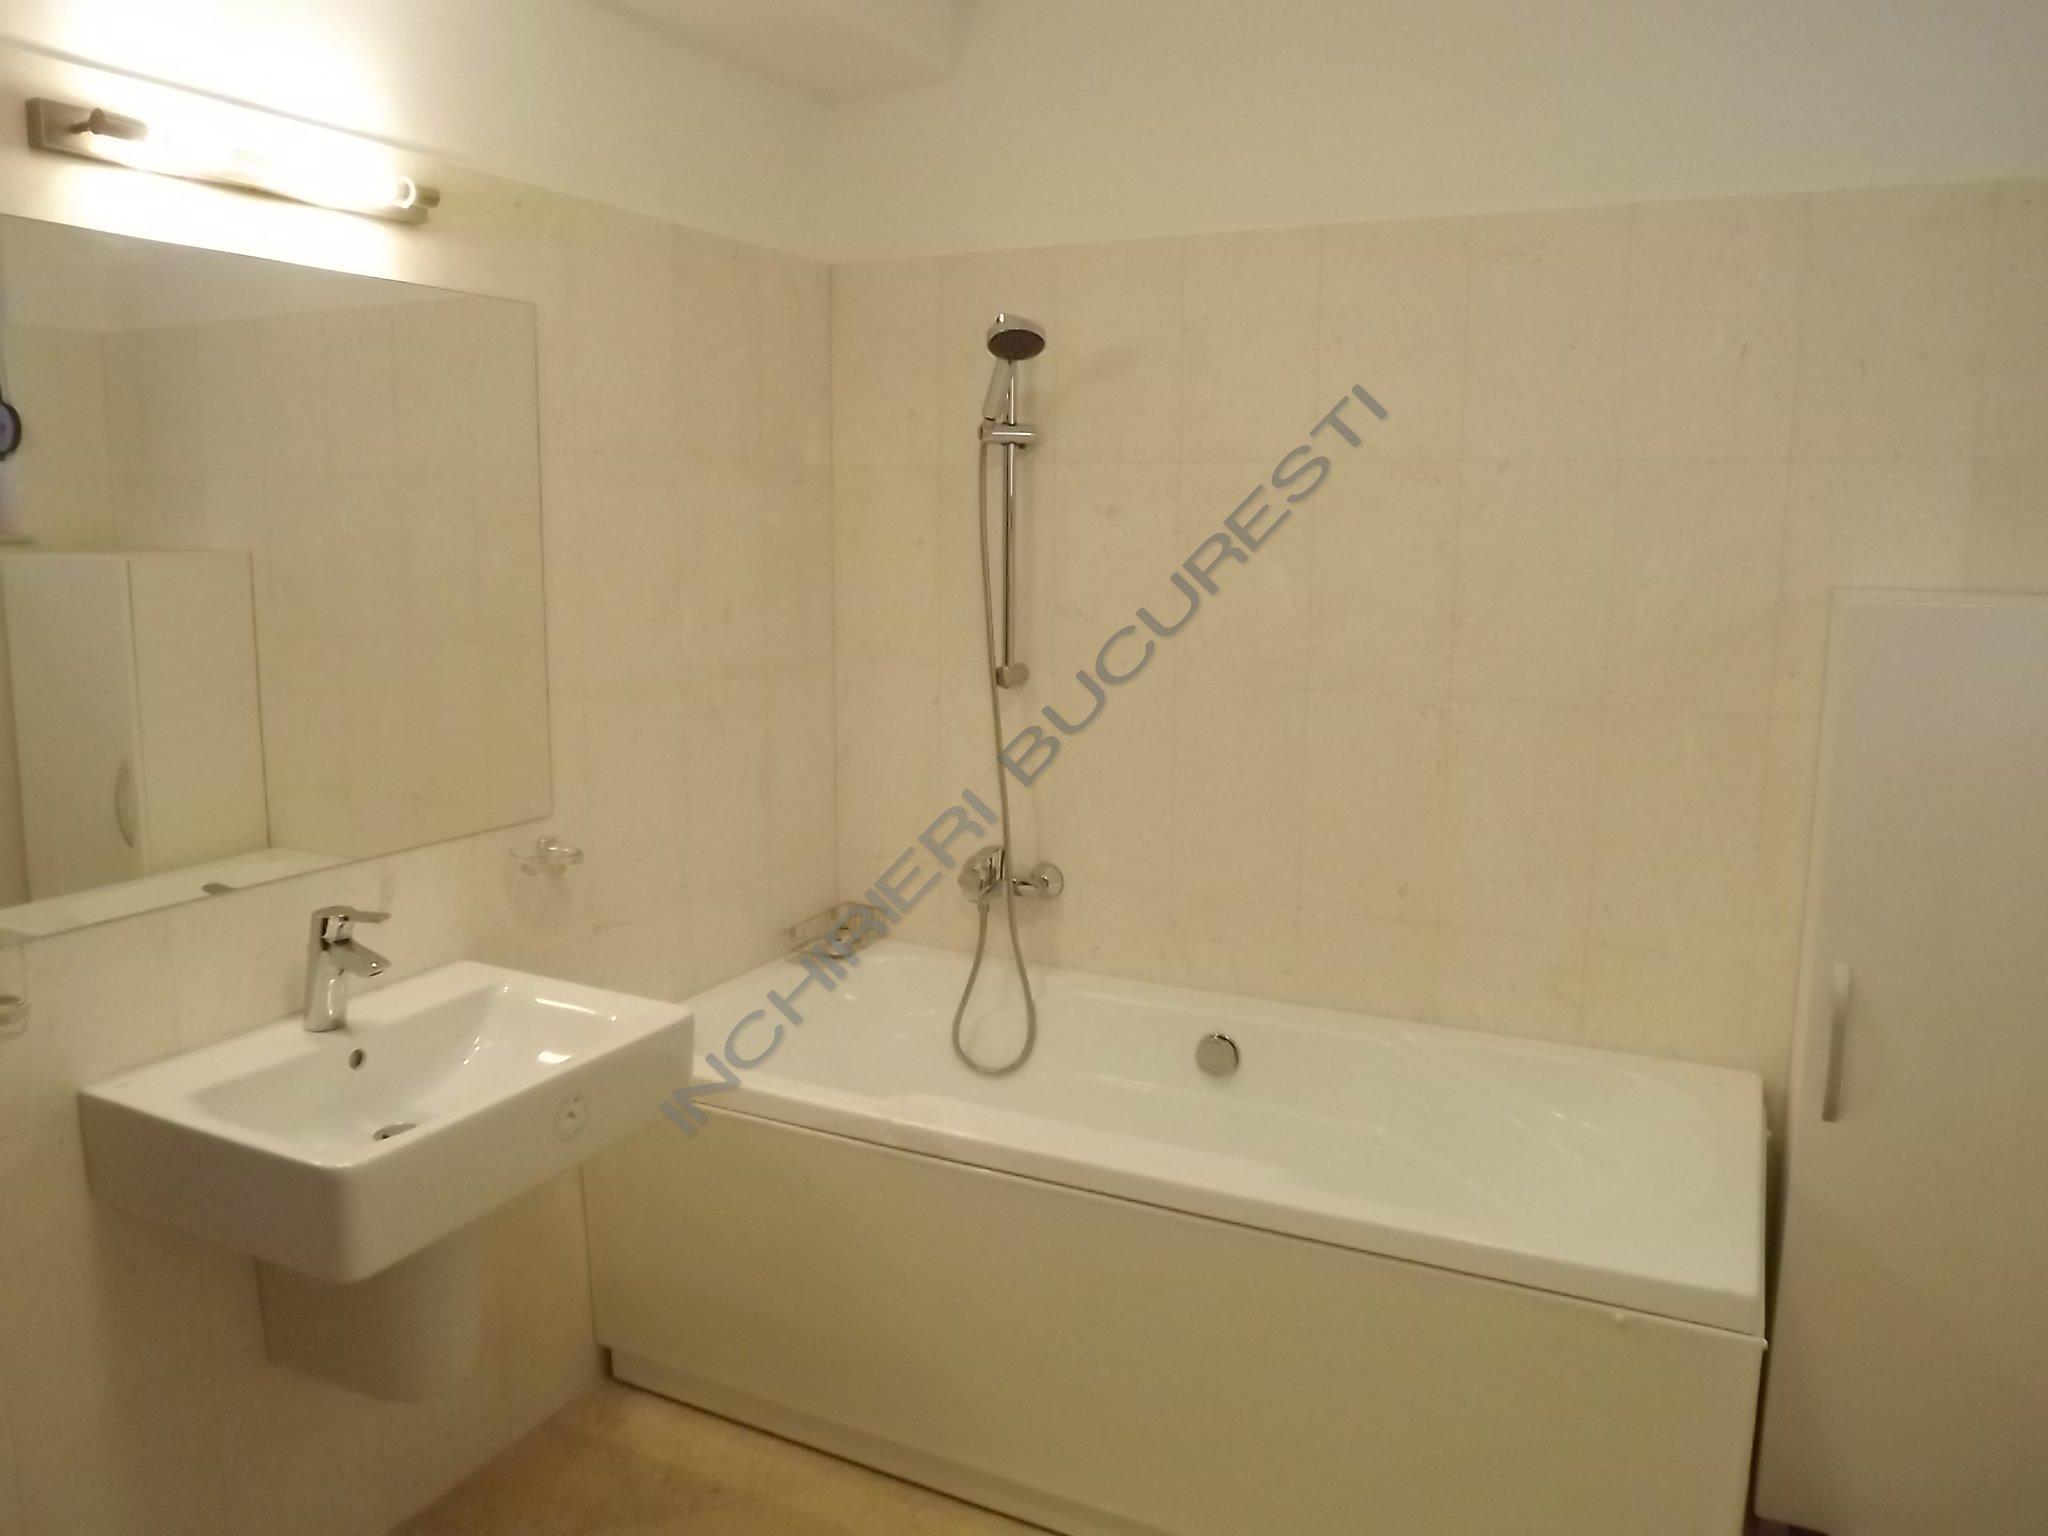 baie alba renovata apartament domenii